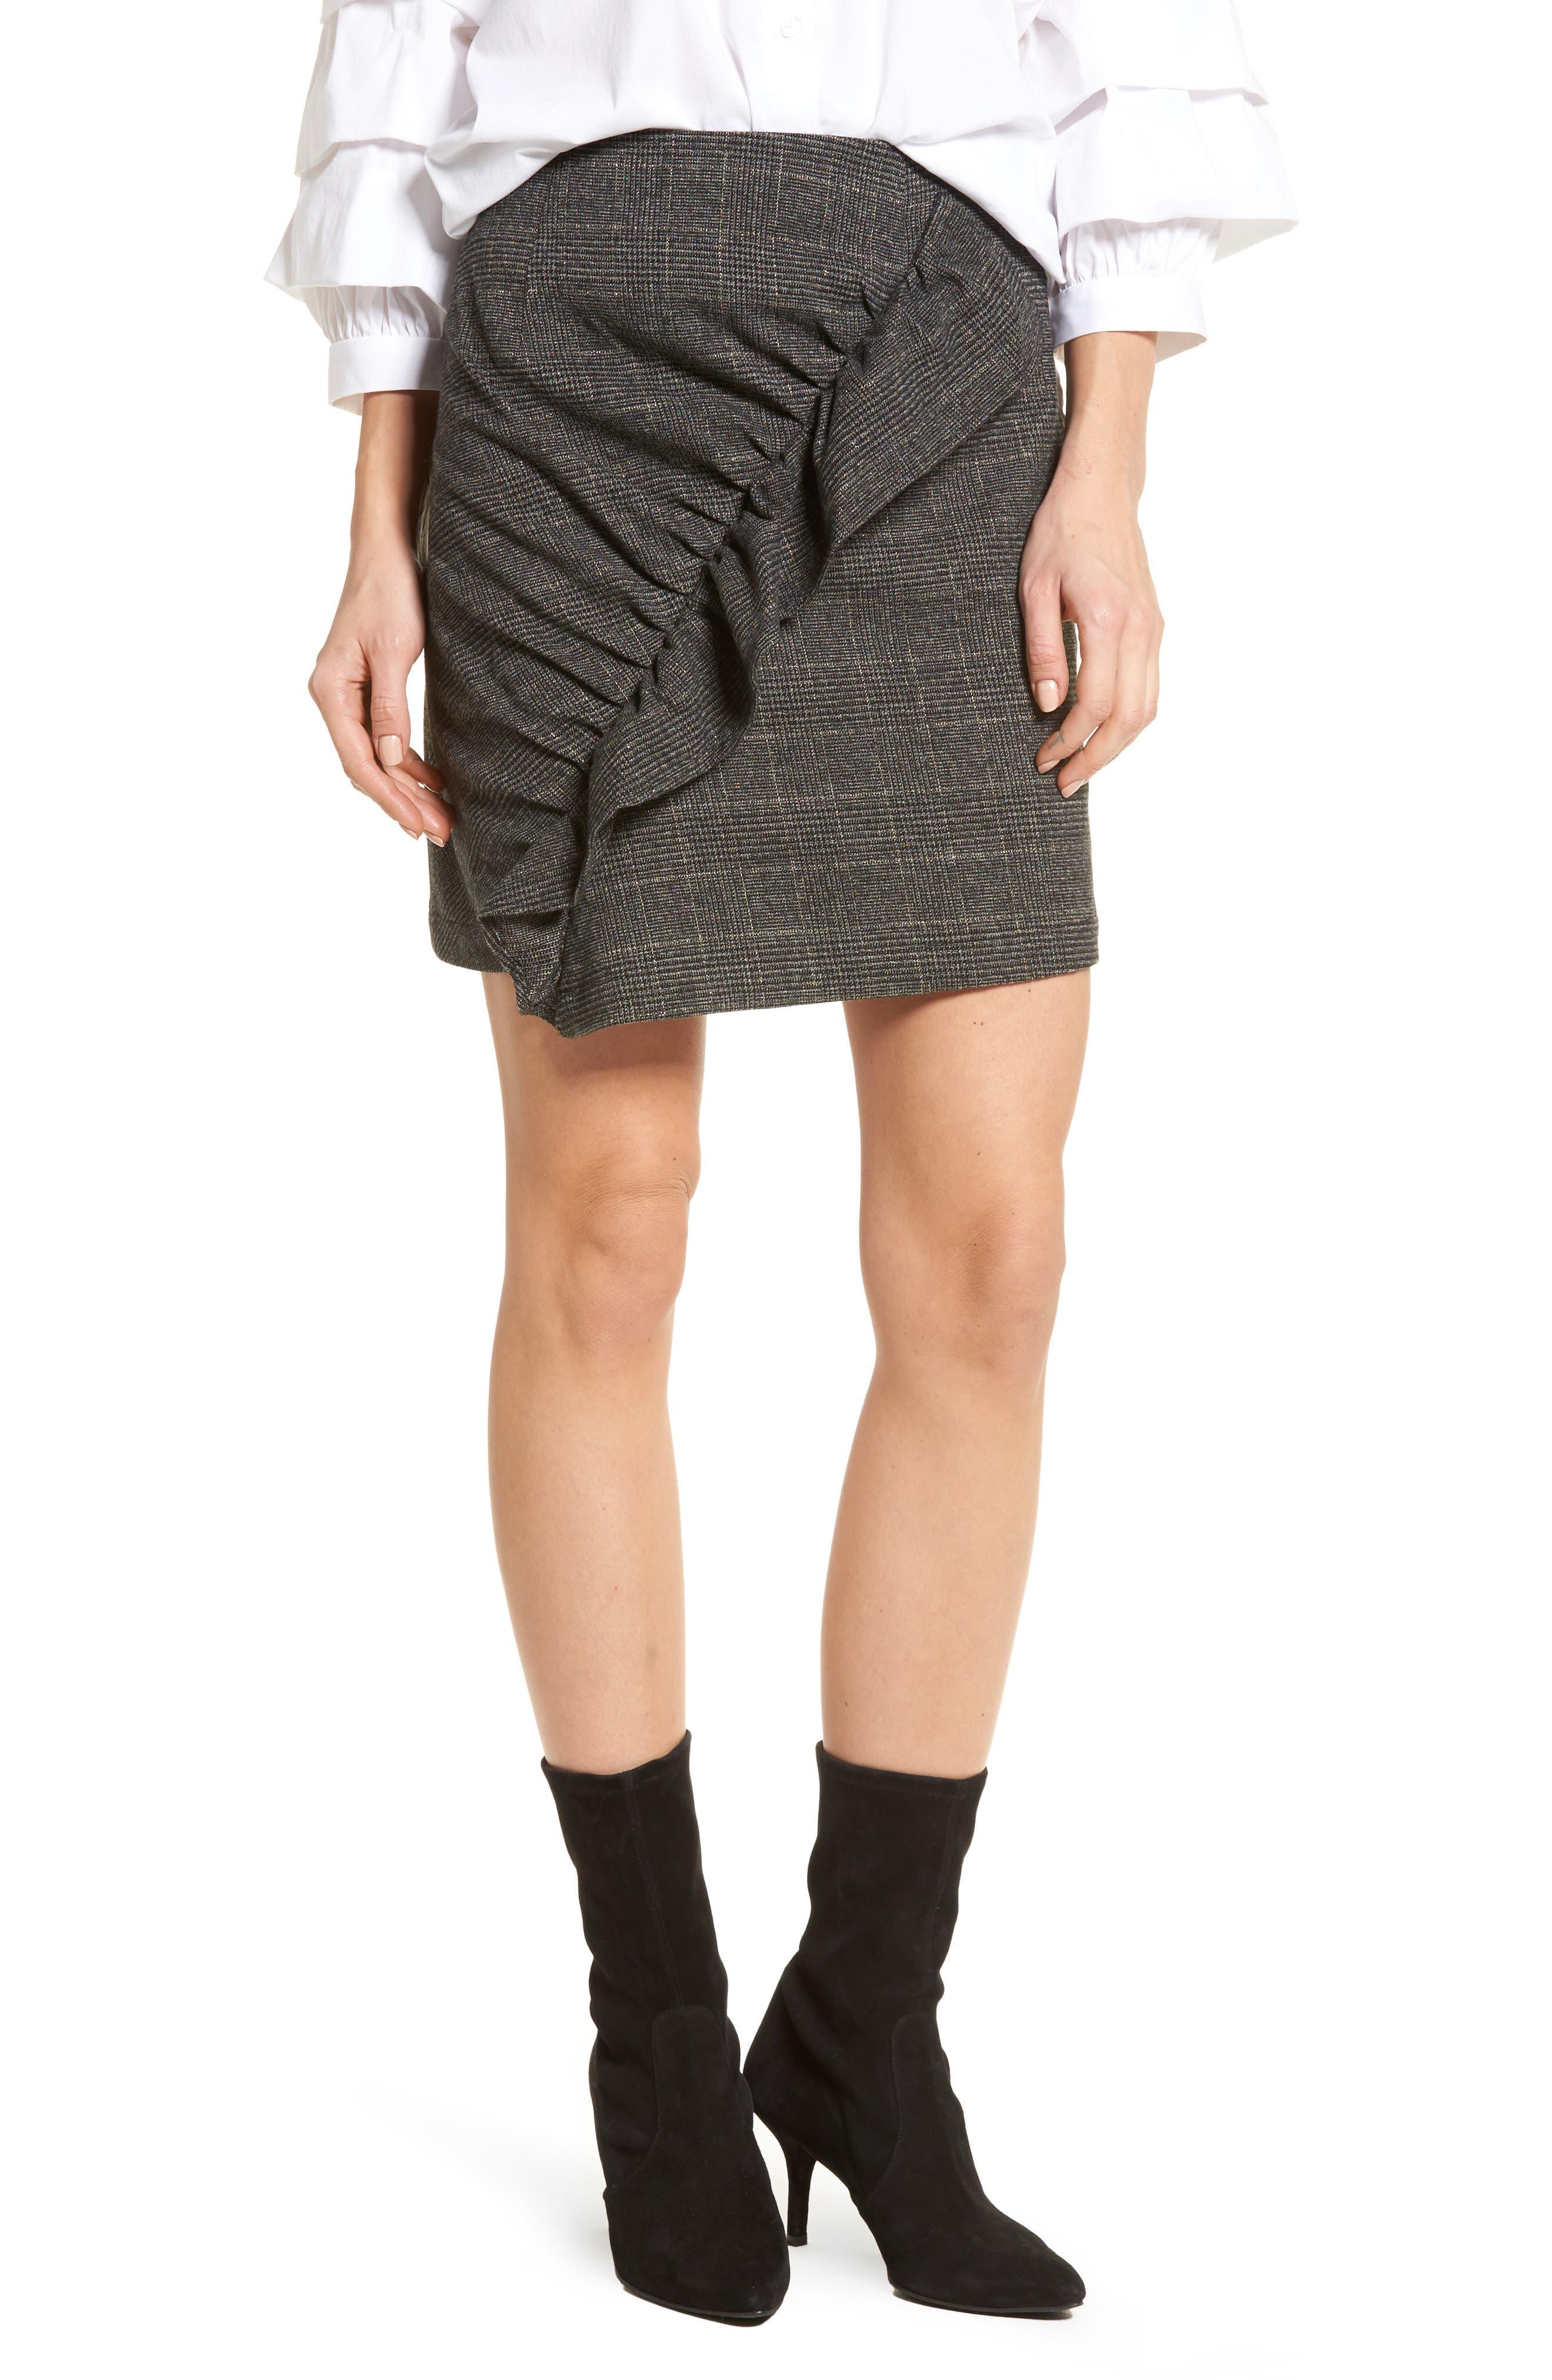 Glen Plaid Ruched Ruffle Skirt,                             Main thumbnail 1, color,                             001